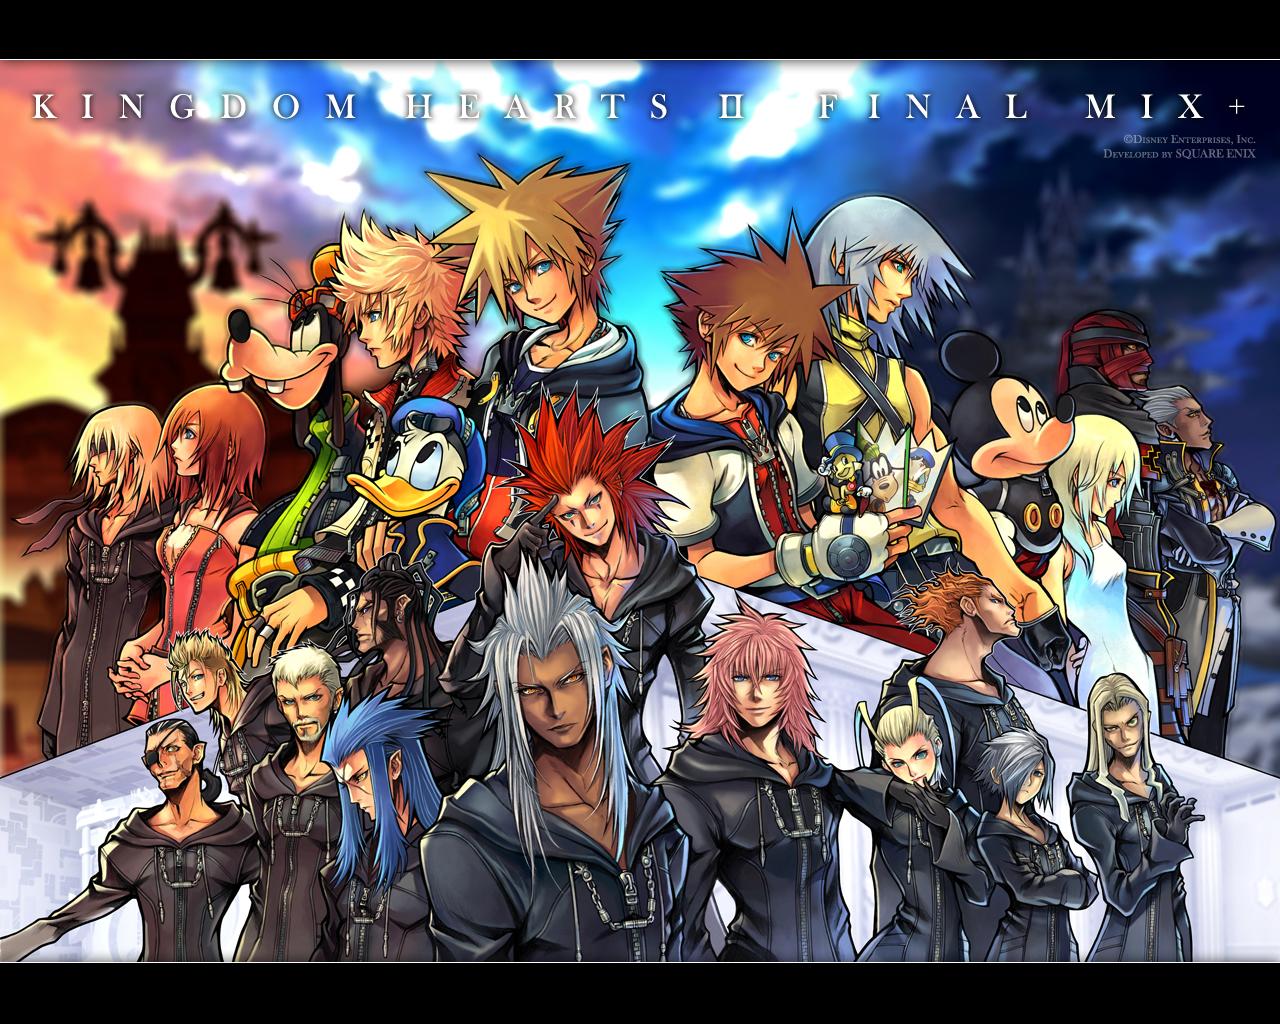 Kingdom Hearts Wallpaper PSP Gear   PSP Games Download 1280x1024